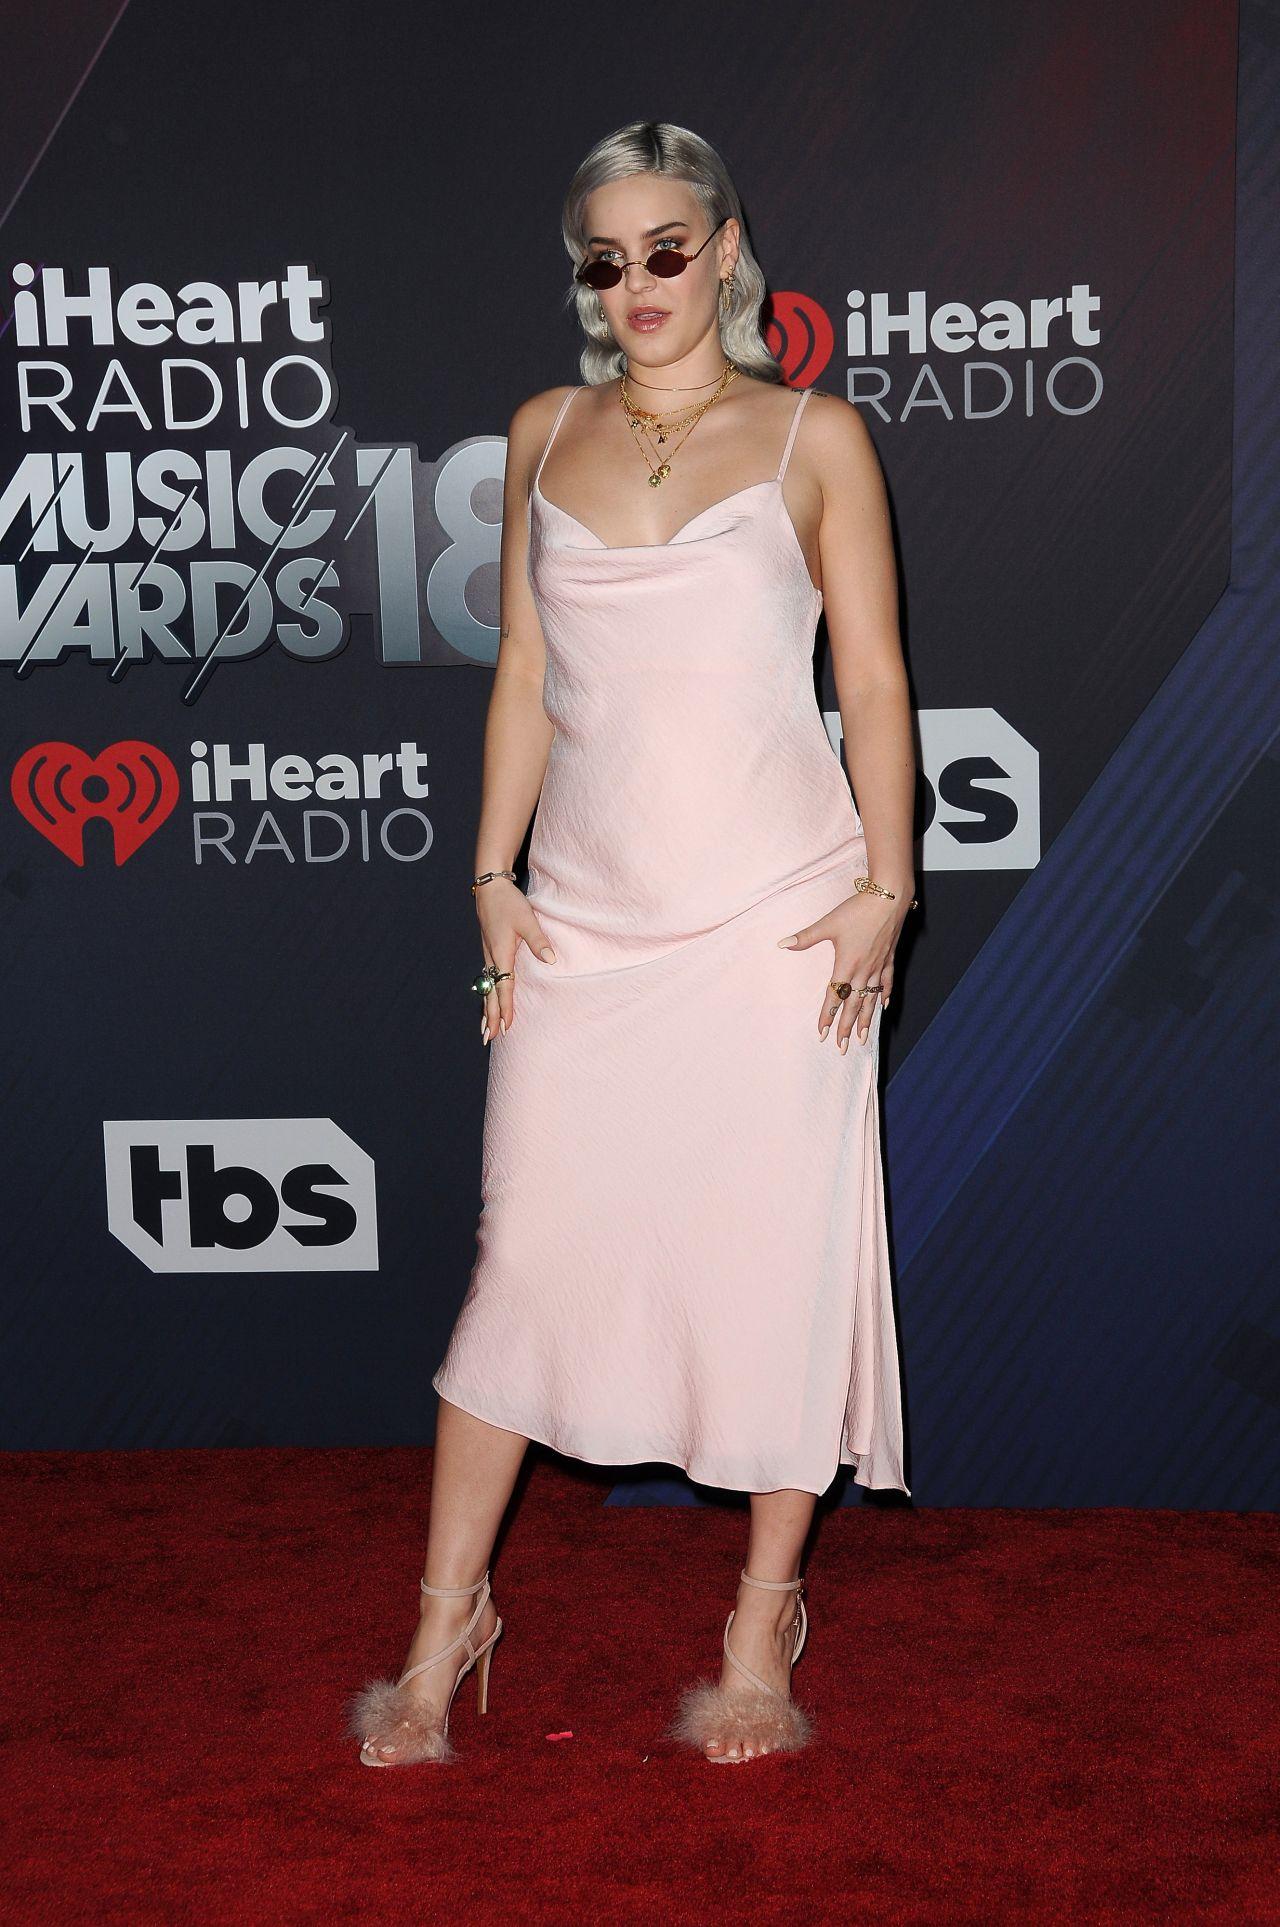 Iheartradio Awards